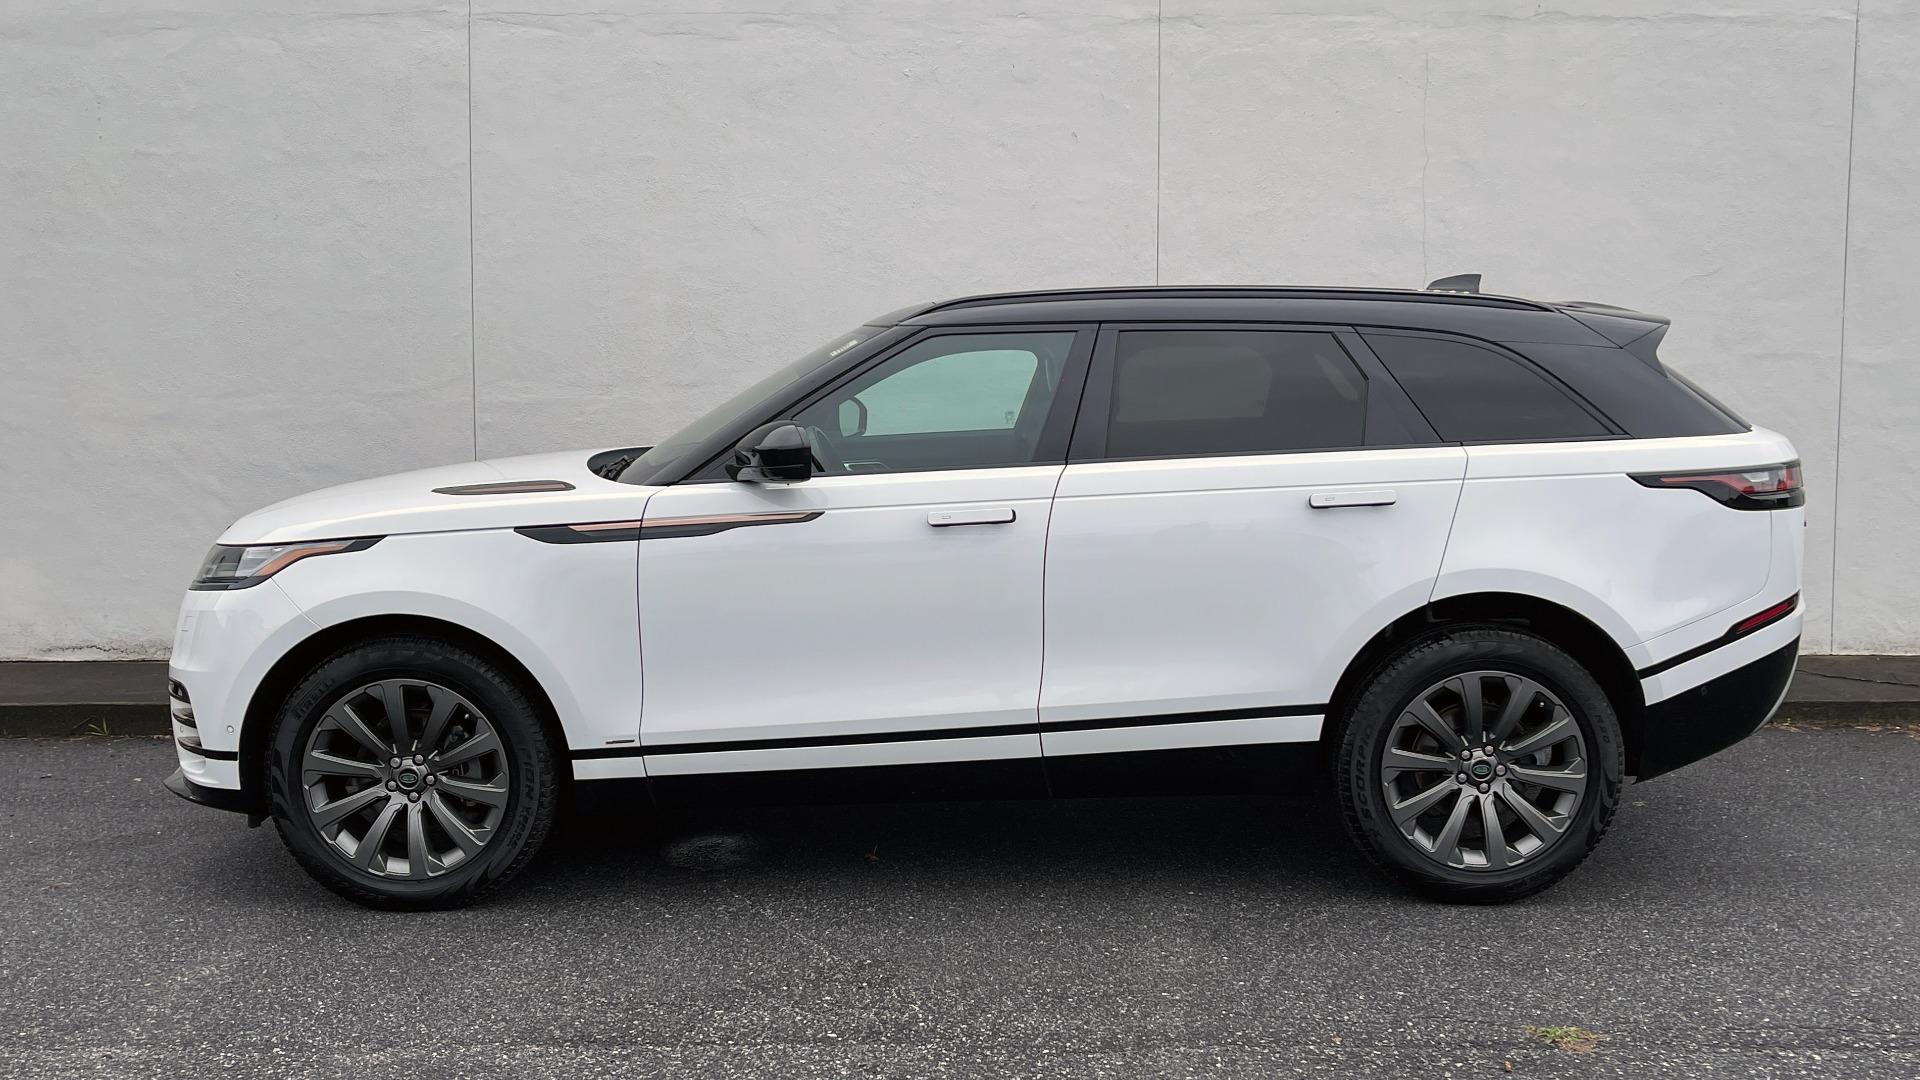 Used 2018 Land Rover RANGE ROVER VELAR R-DYNAMIC SE / NAV / PREM / MERIDIAN / SUNROOF / REARVIEW for sale $54,995 at Formula Imports in Charlotte NC 28227 2